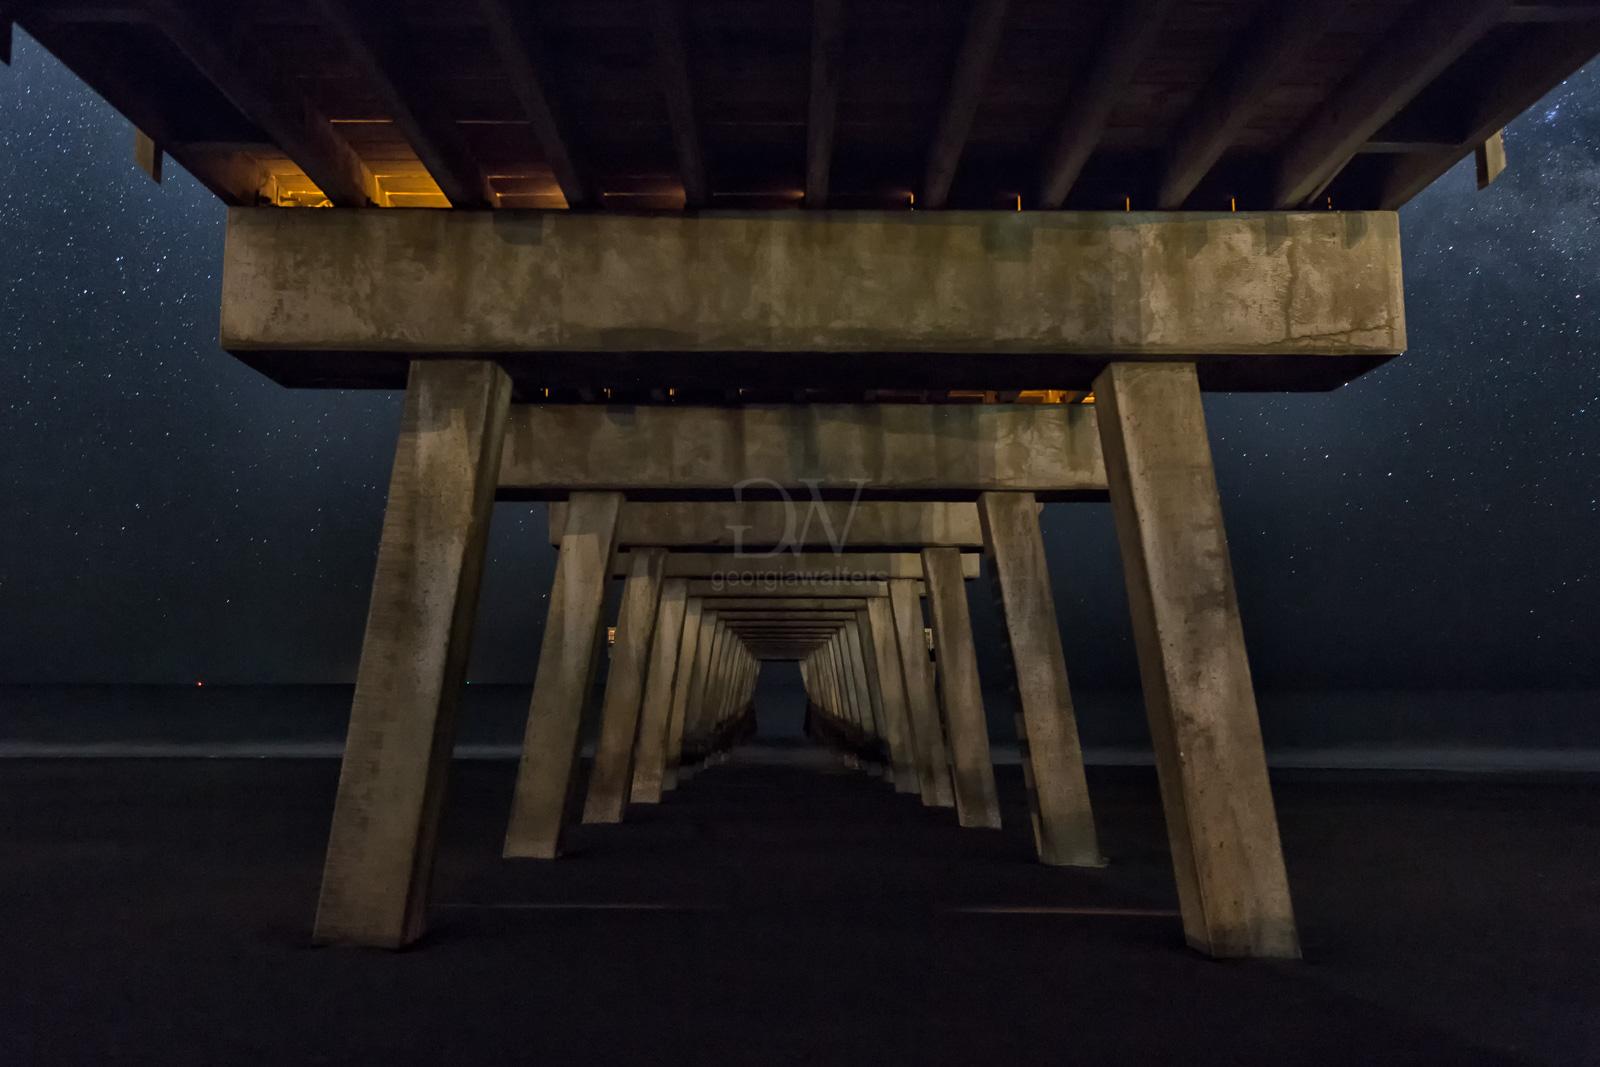 Beneath the Tybee Island pier.